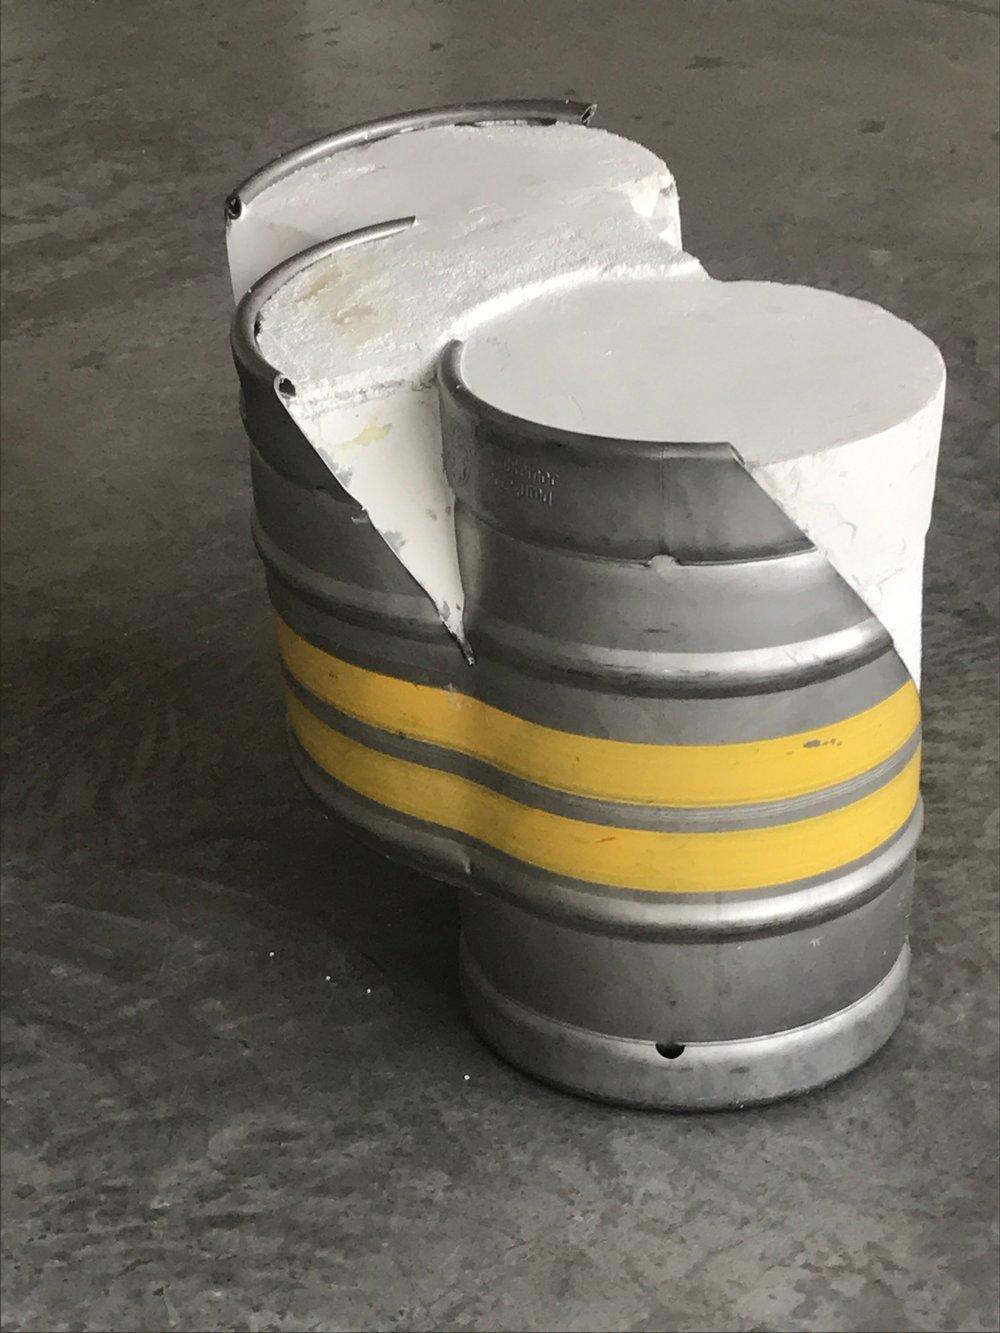 Barrel (image 1 of 3)